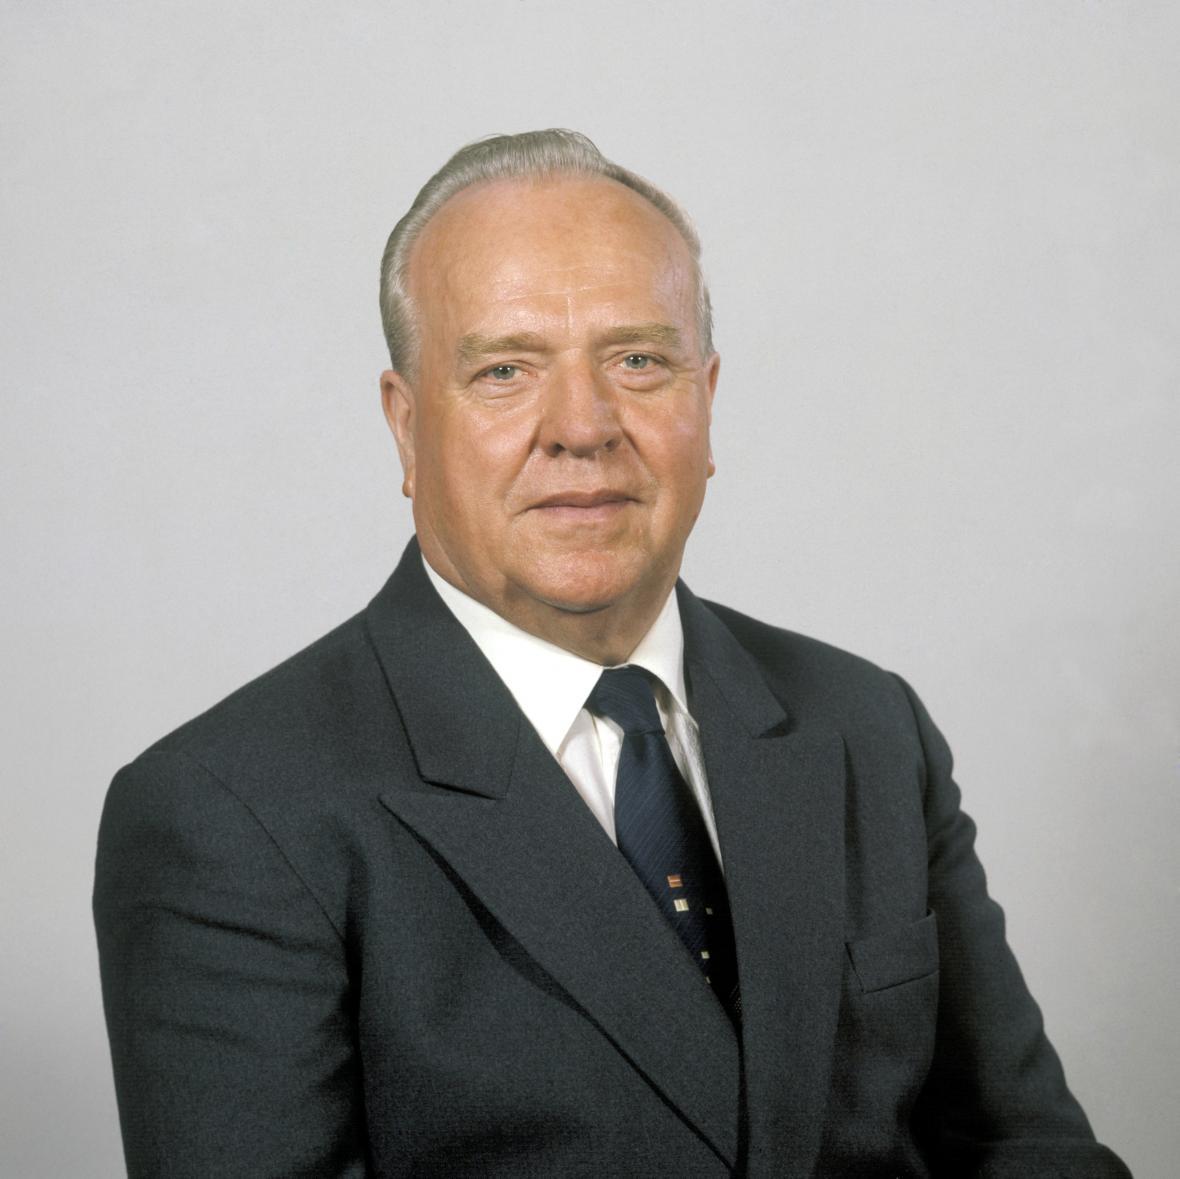 Ladislav Adamec